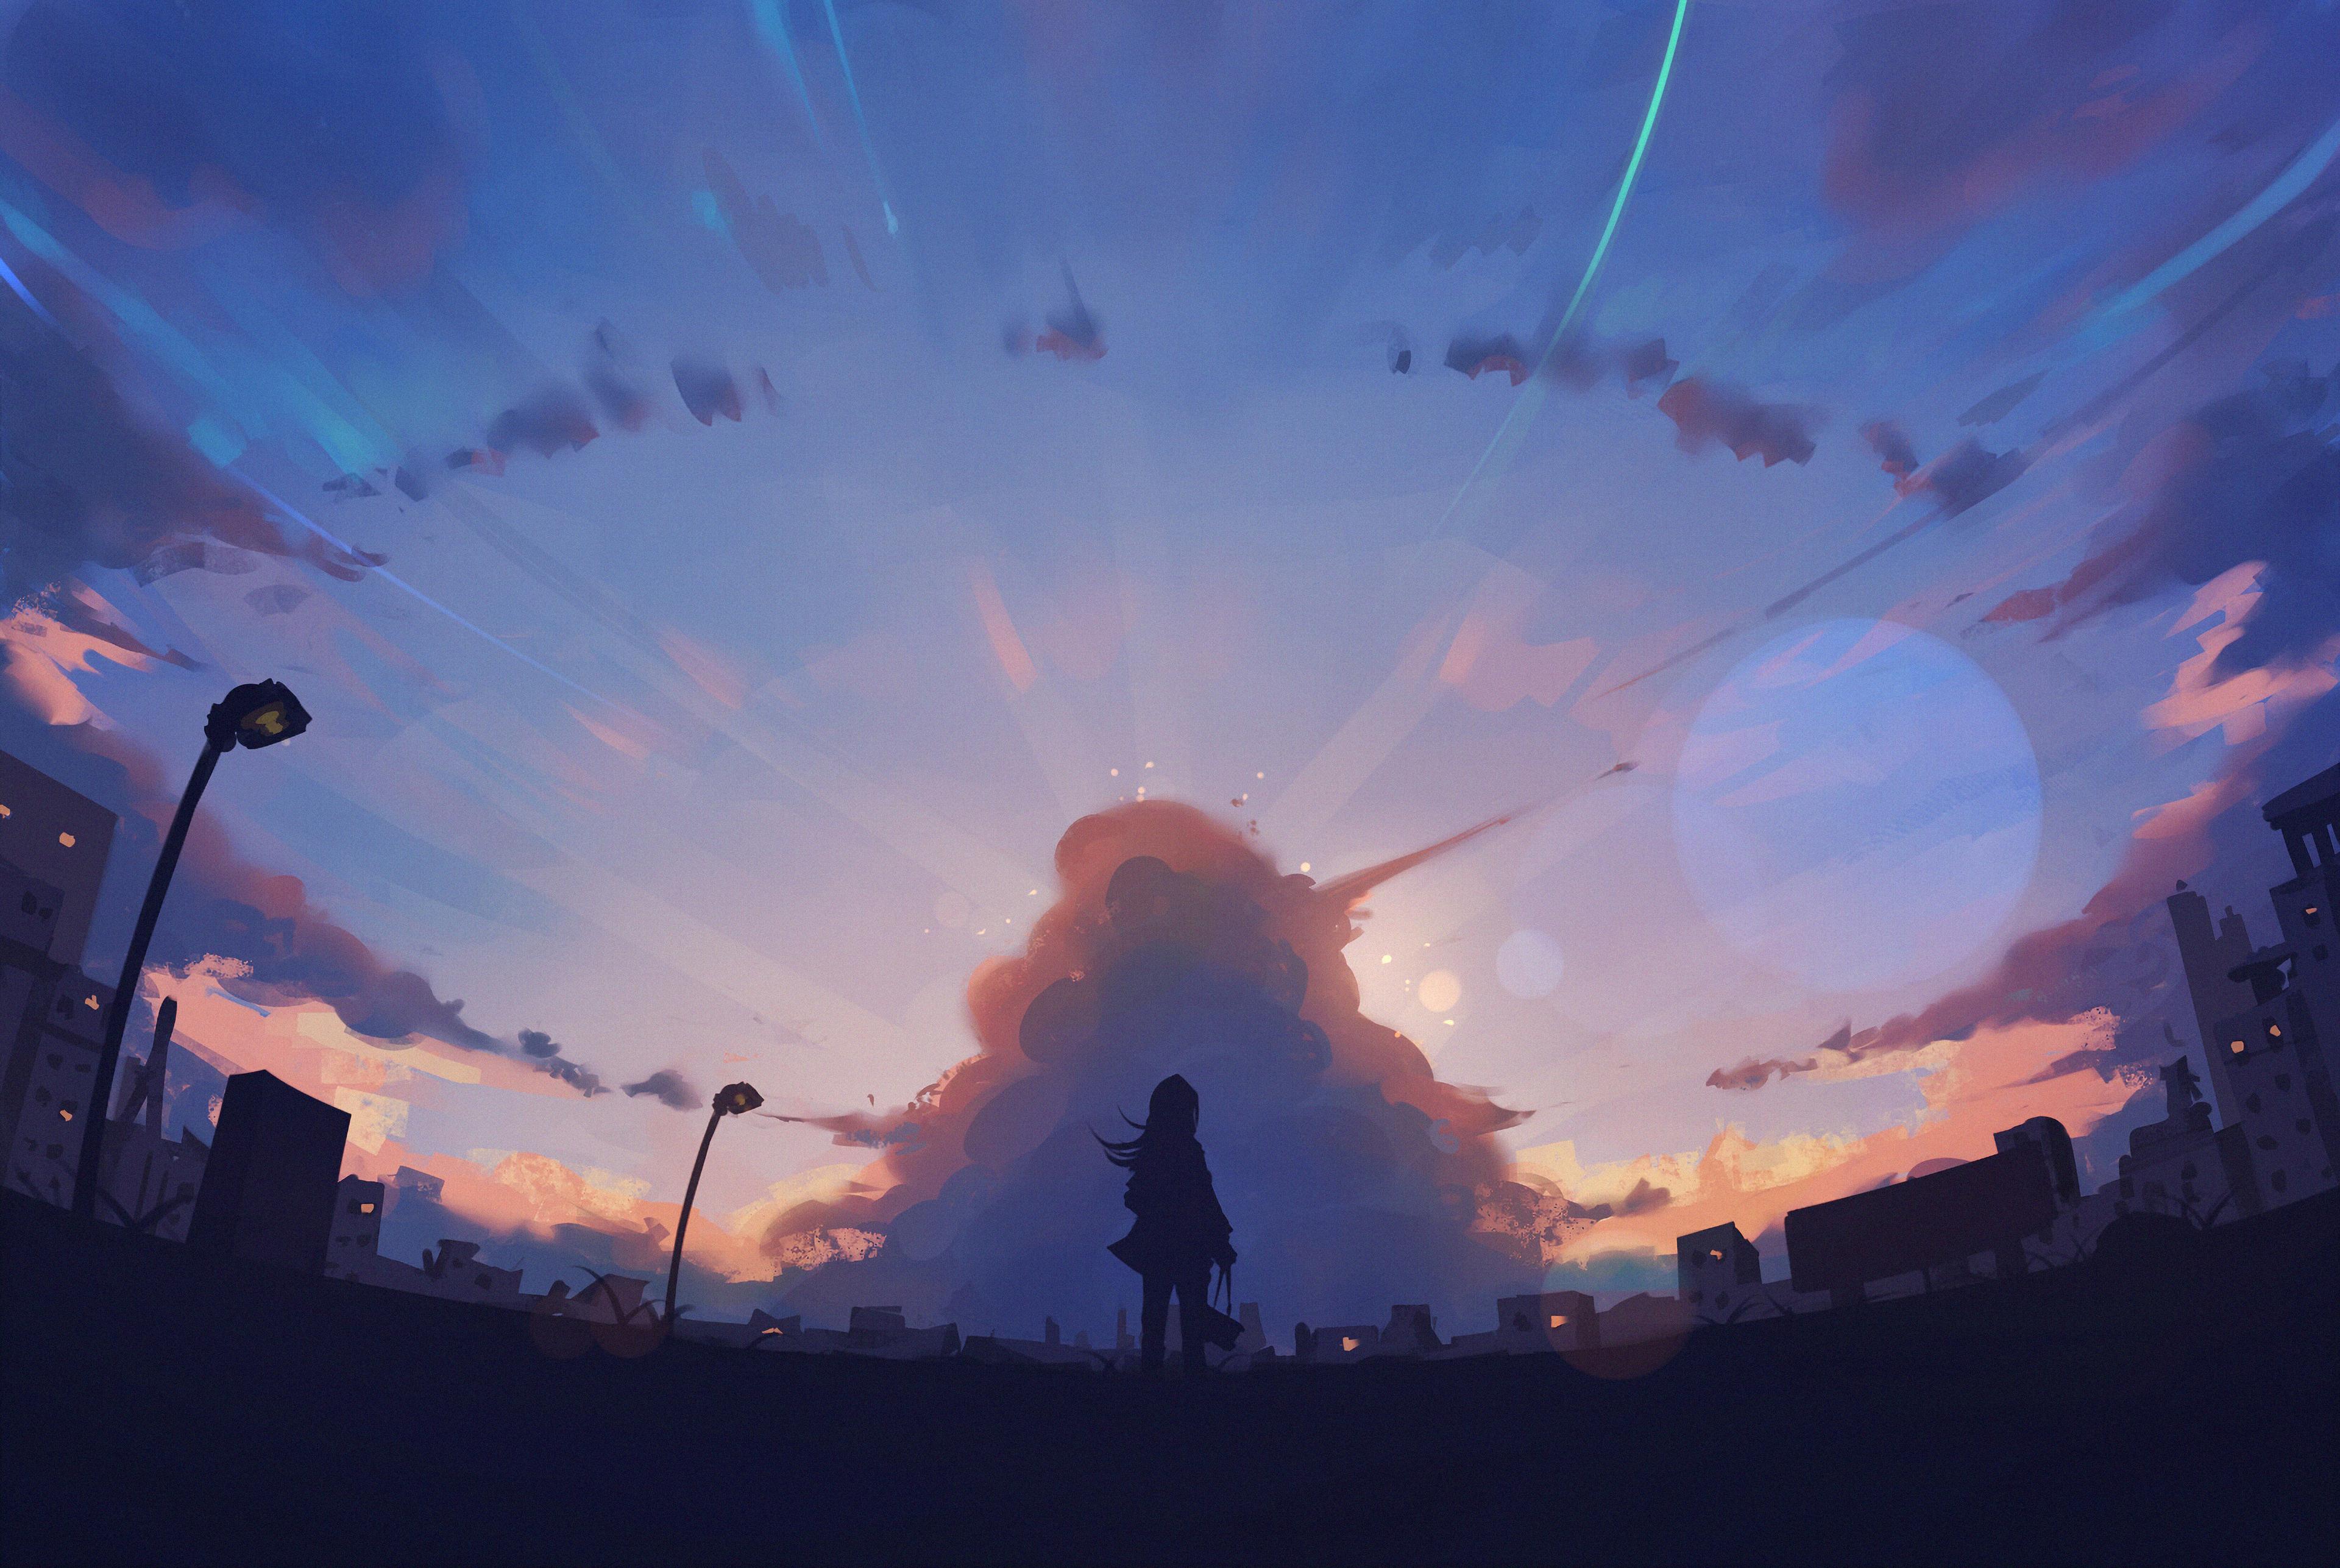 behind the clouds anime 1578253896 - Behind The Clouds Anime -